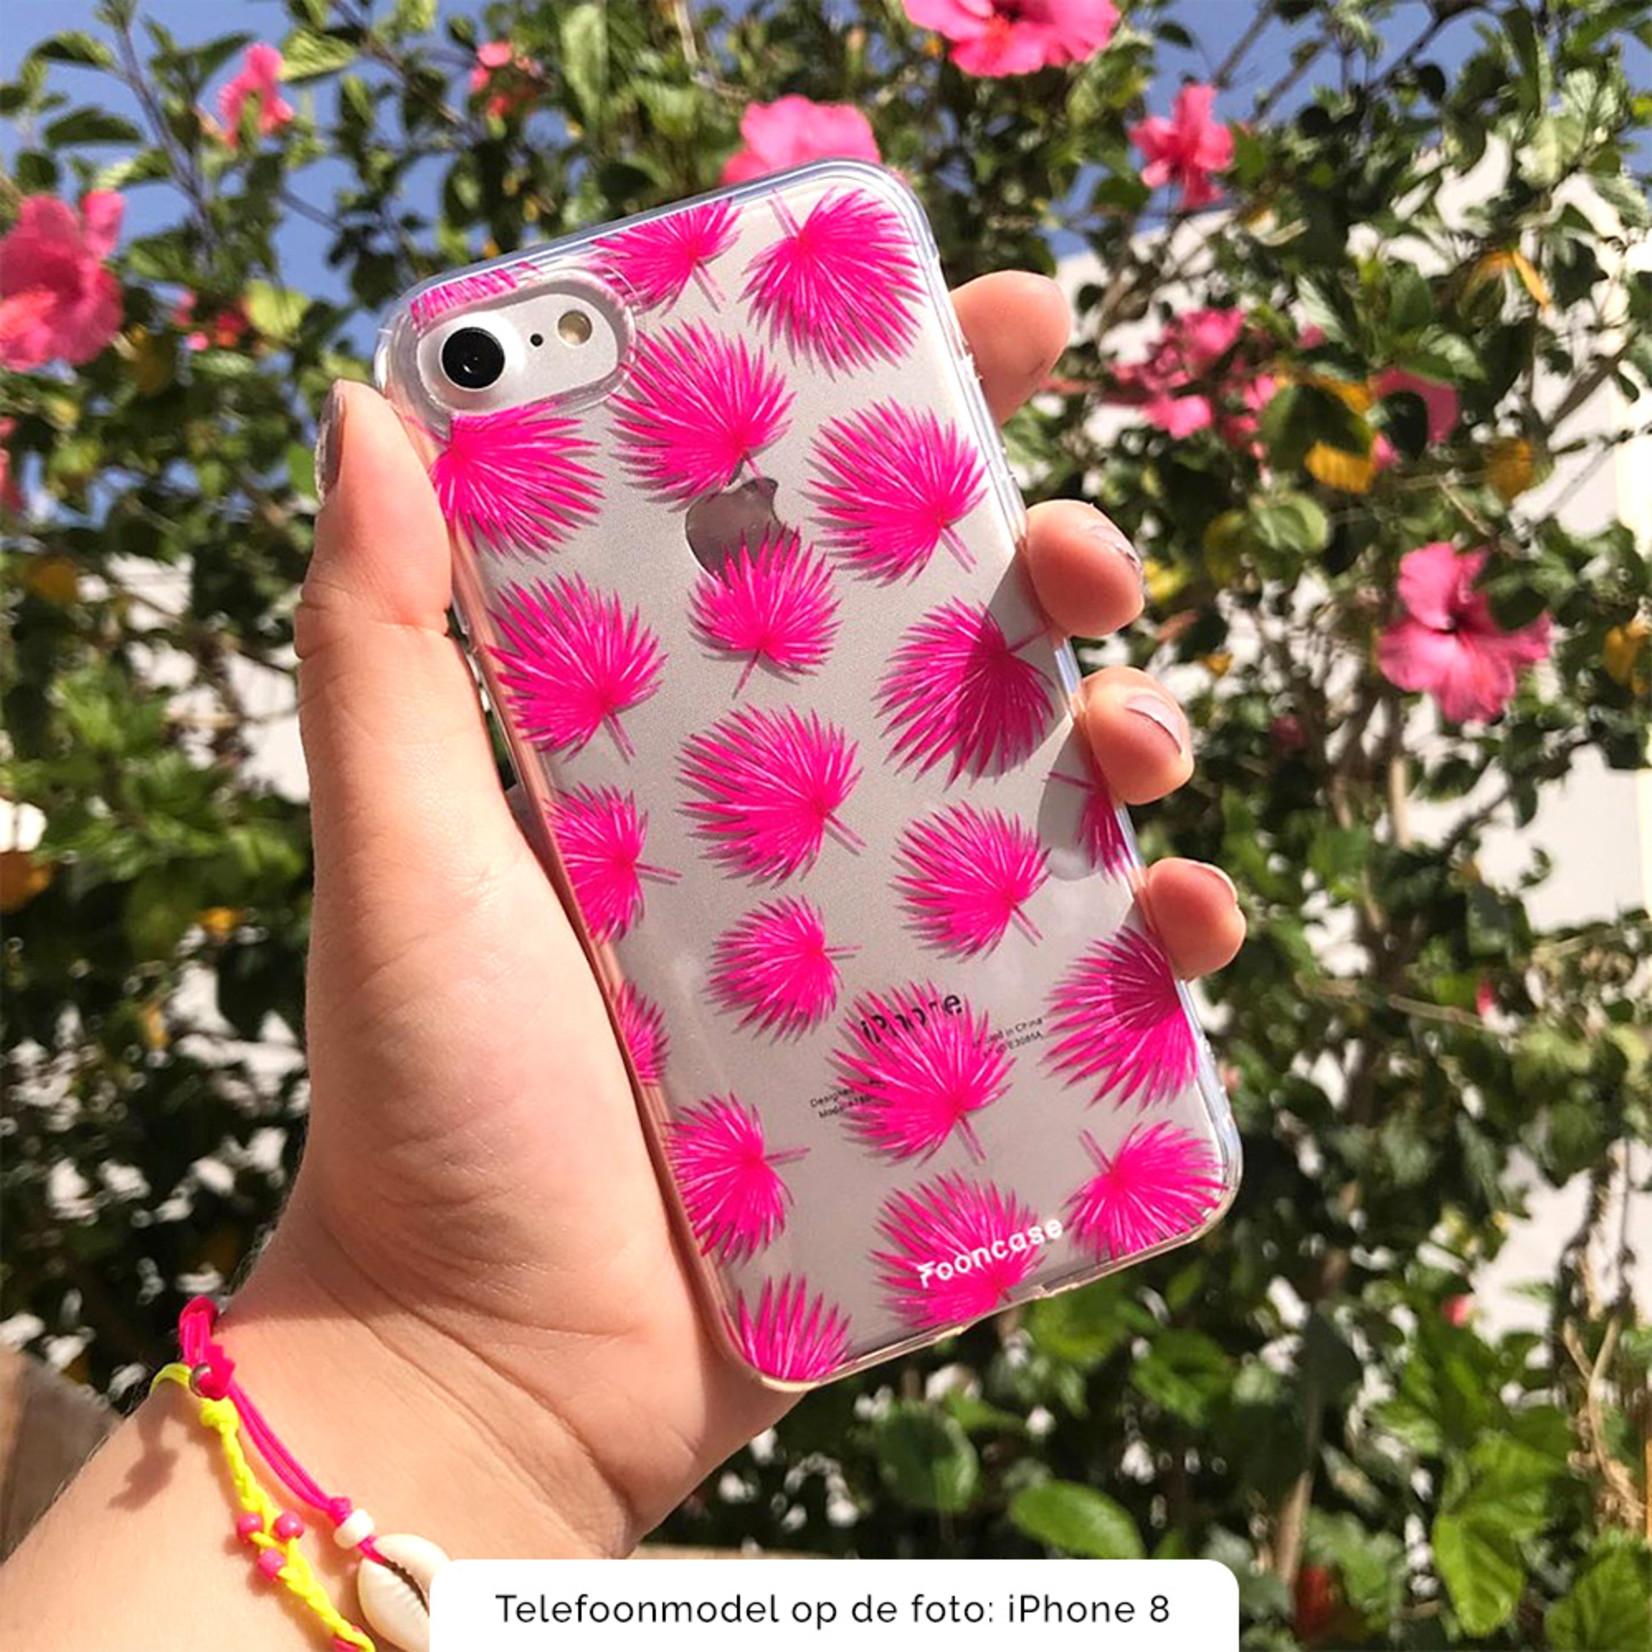 FOONCASE Huawei P8 Lite 2017 Handyhülle - Rosa Blätter